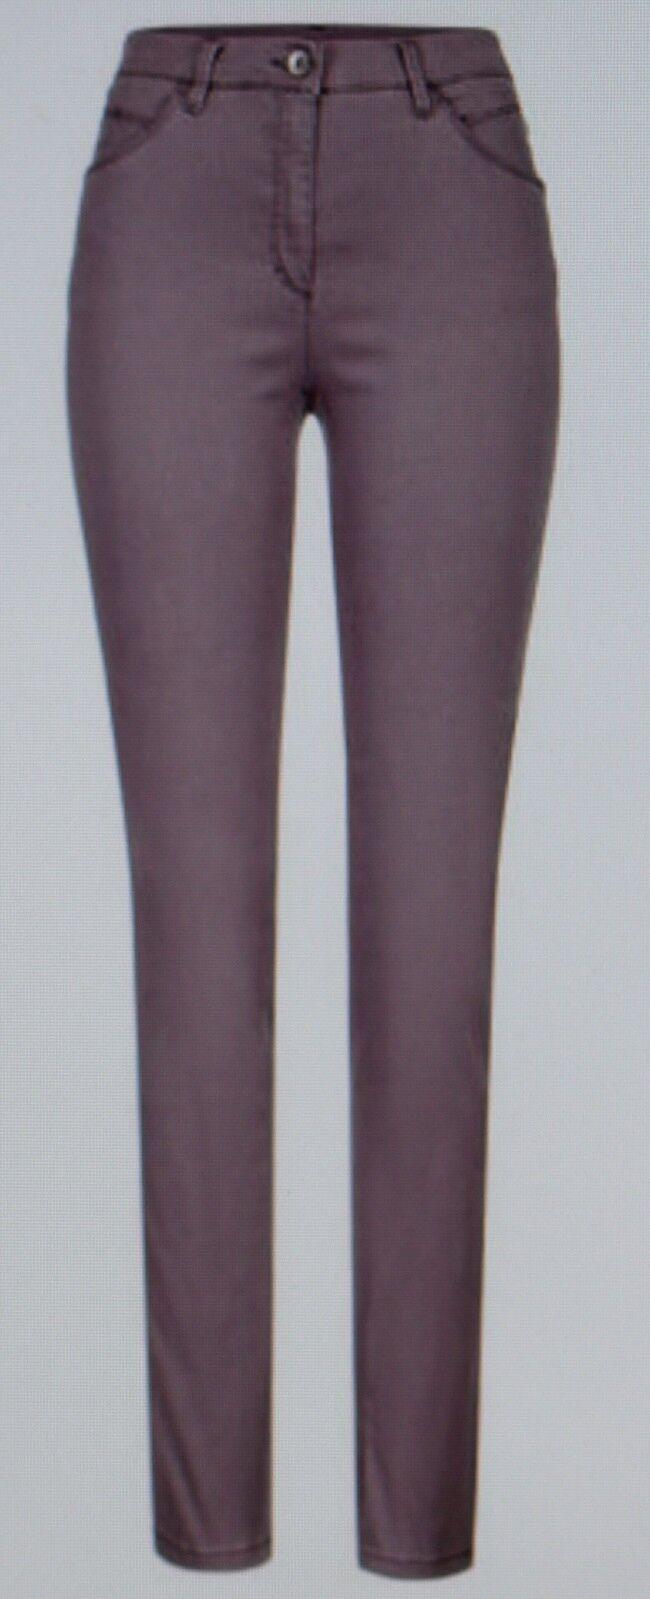 Damen Jeans Hose Brax Rosawood  Model Carola Größe 36K   Neu mit Etikett